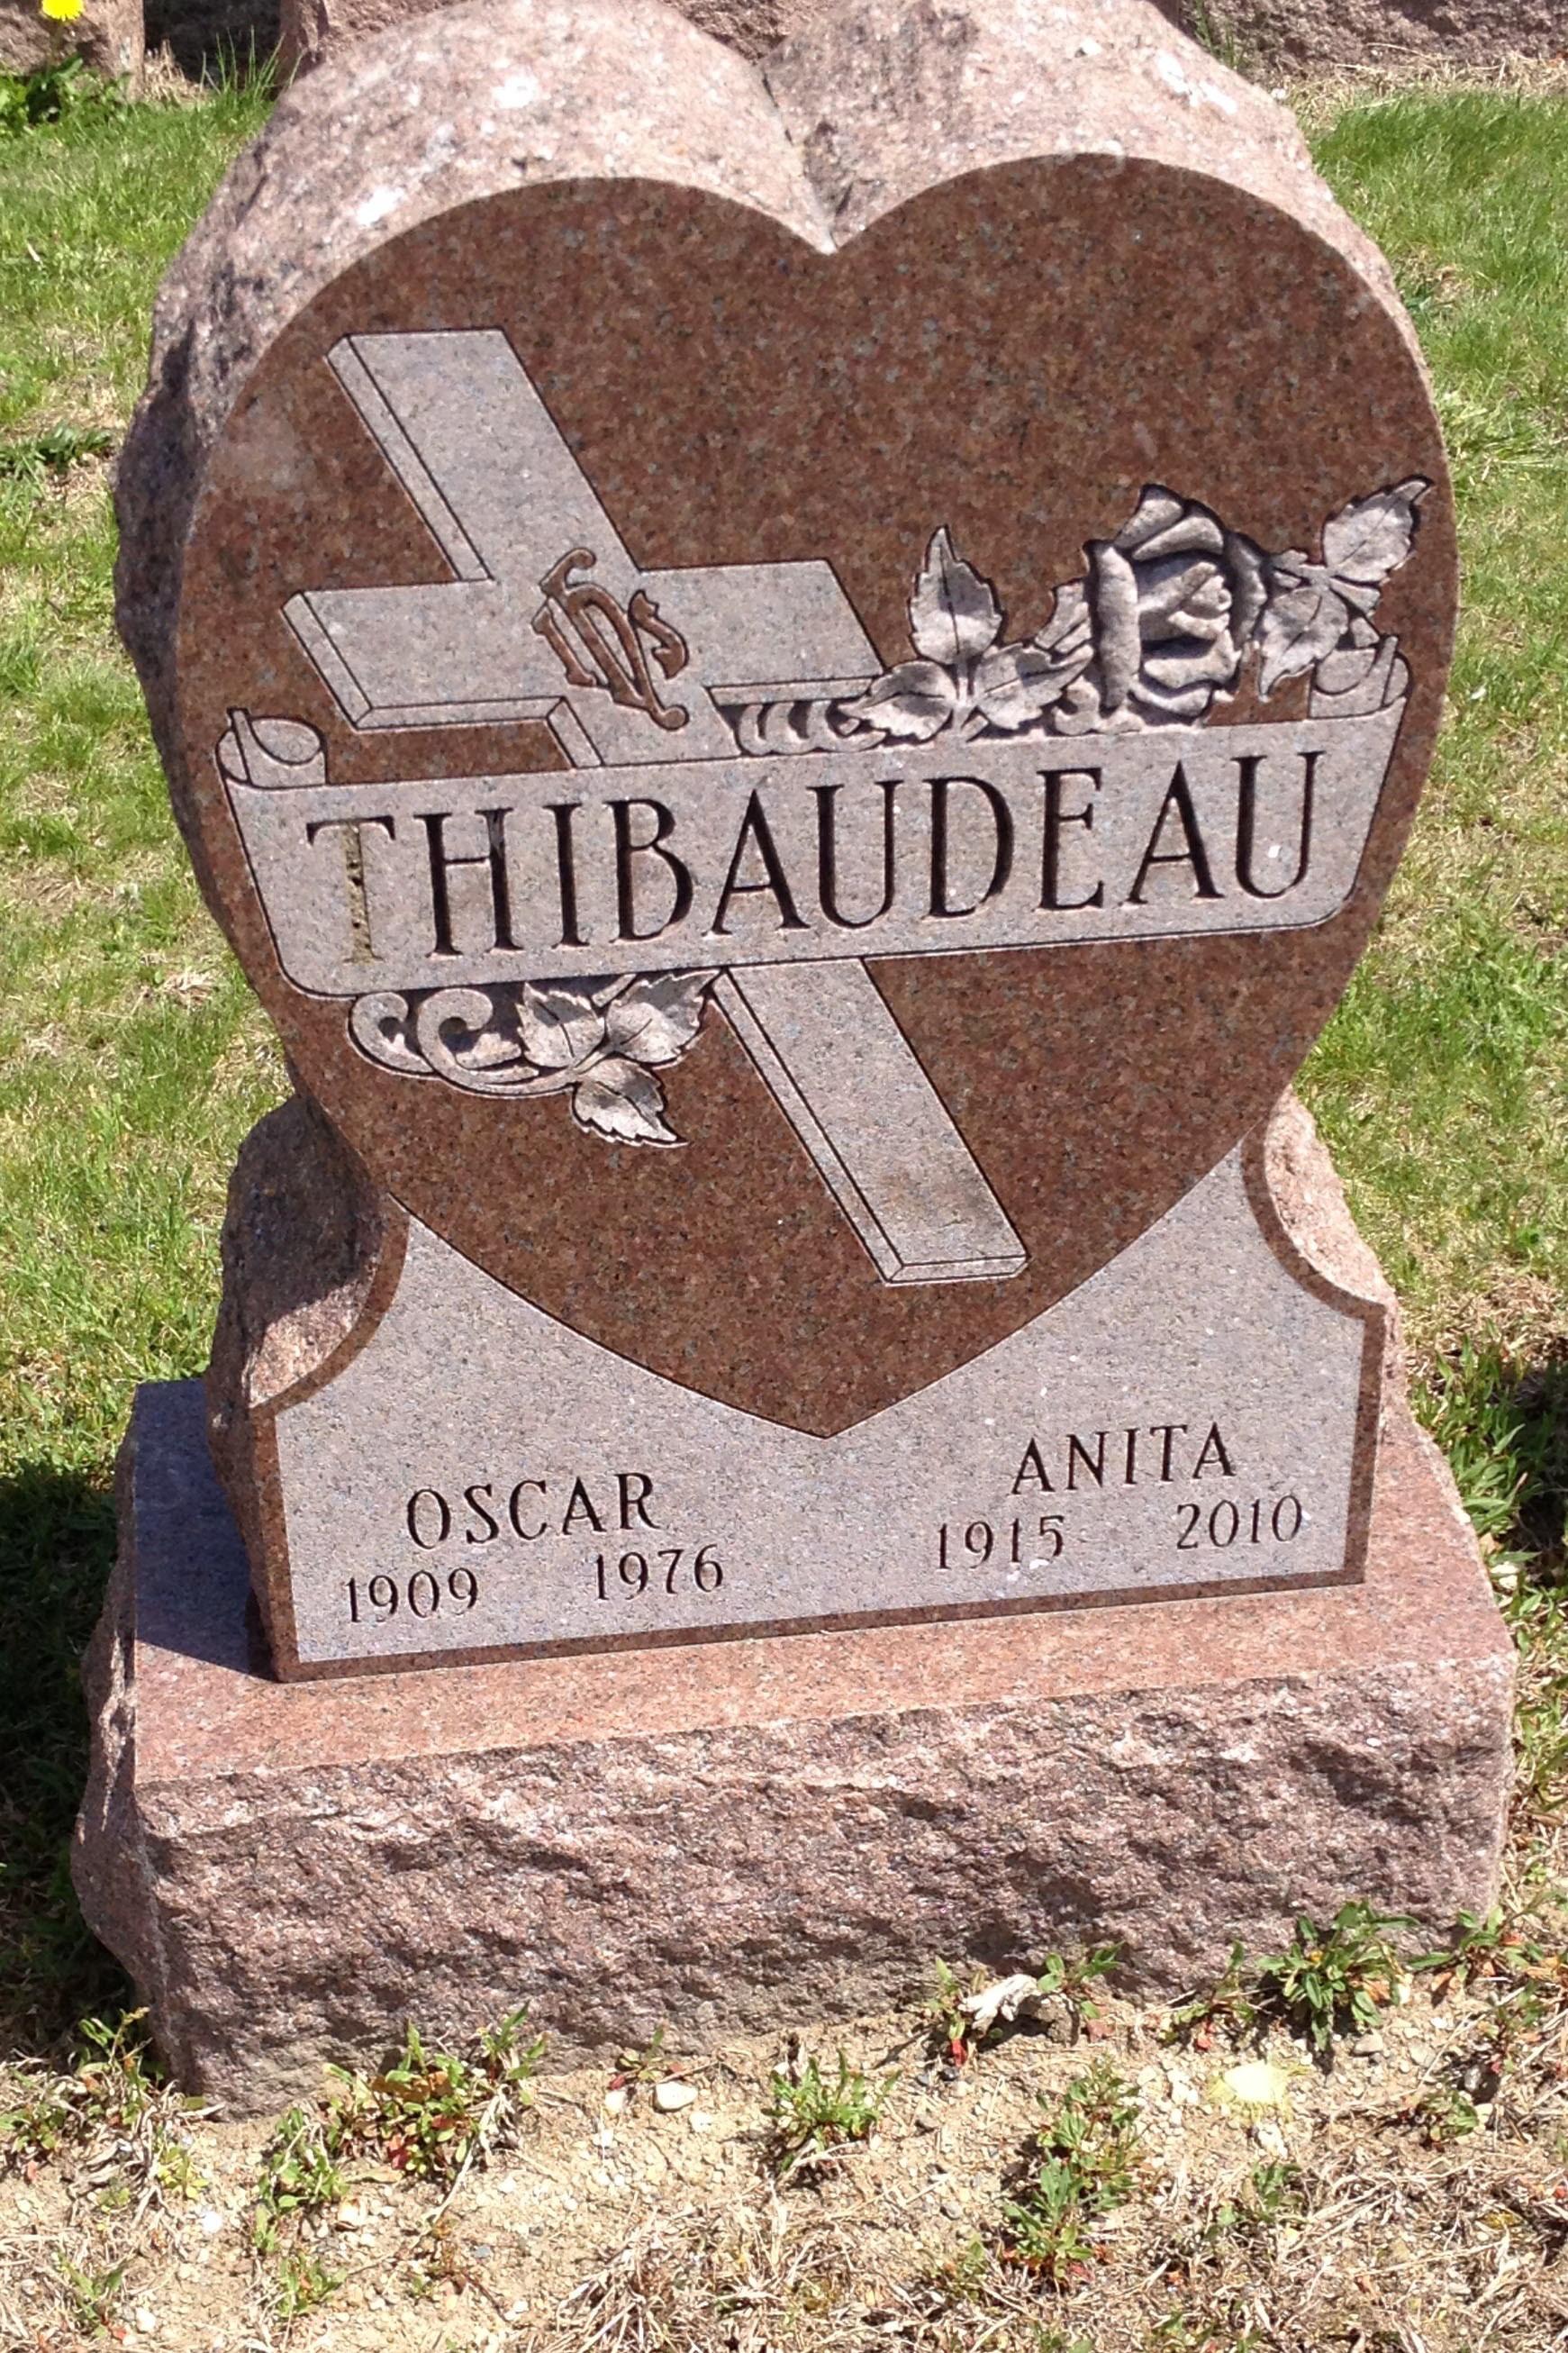 Guy Thibaudeau